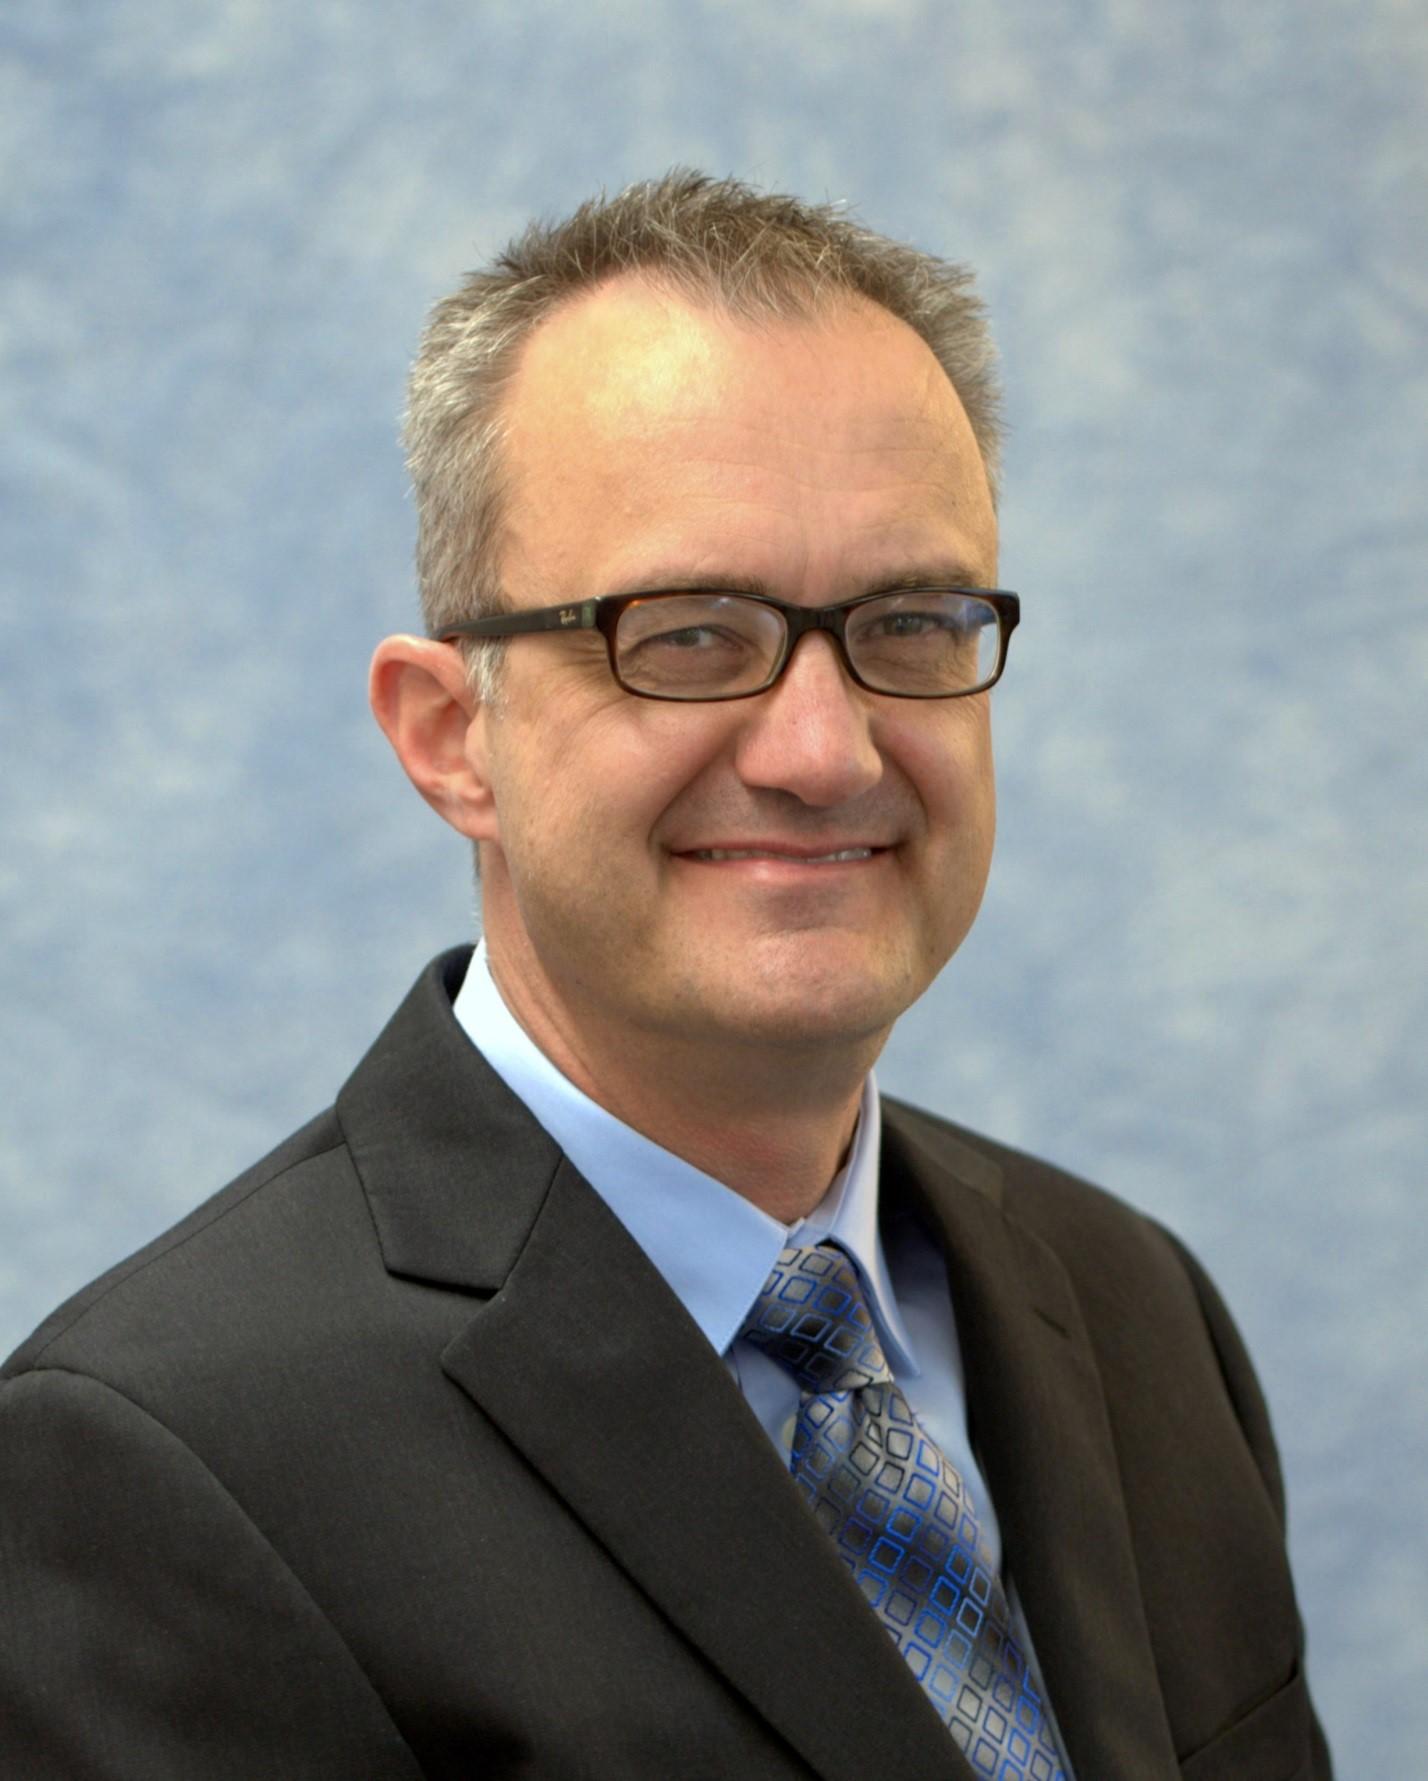 Dr. Matthew Biggerstaff